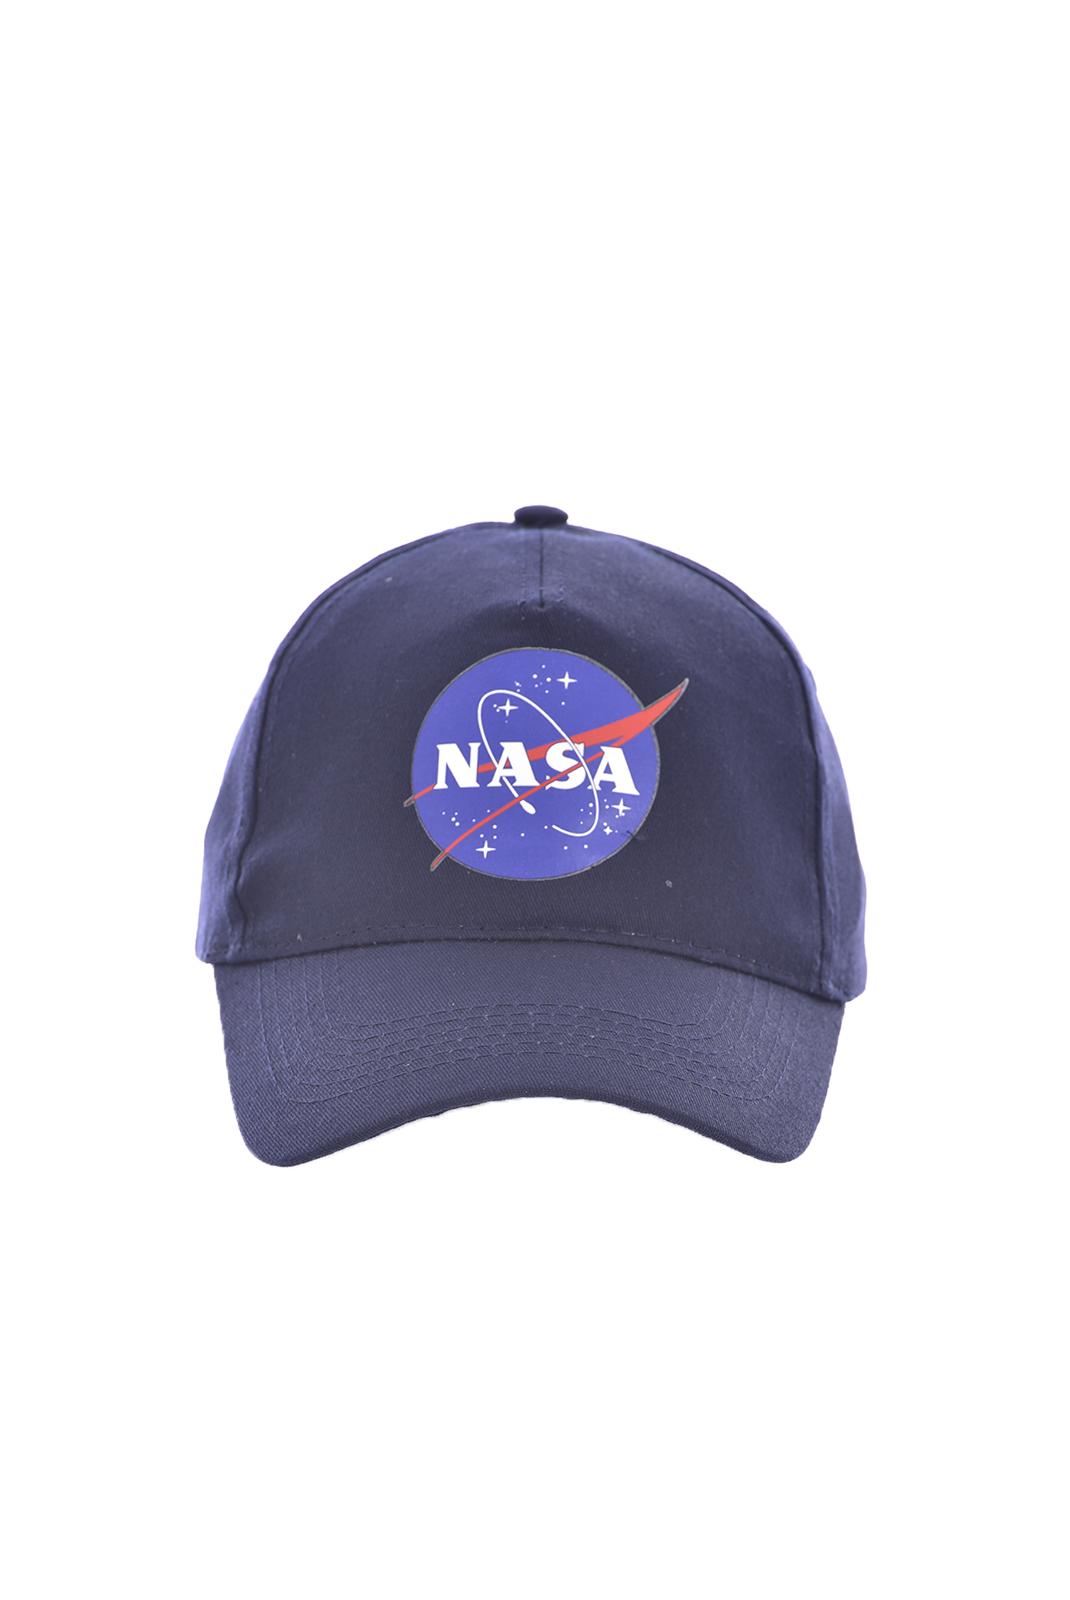 Bonnets / Casquettes  Nasa BASIC-BALL CAP NAVY